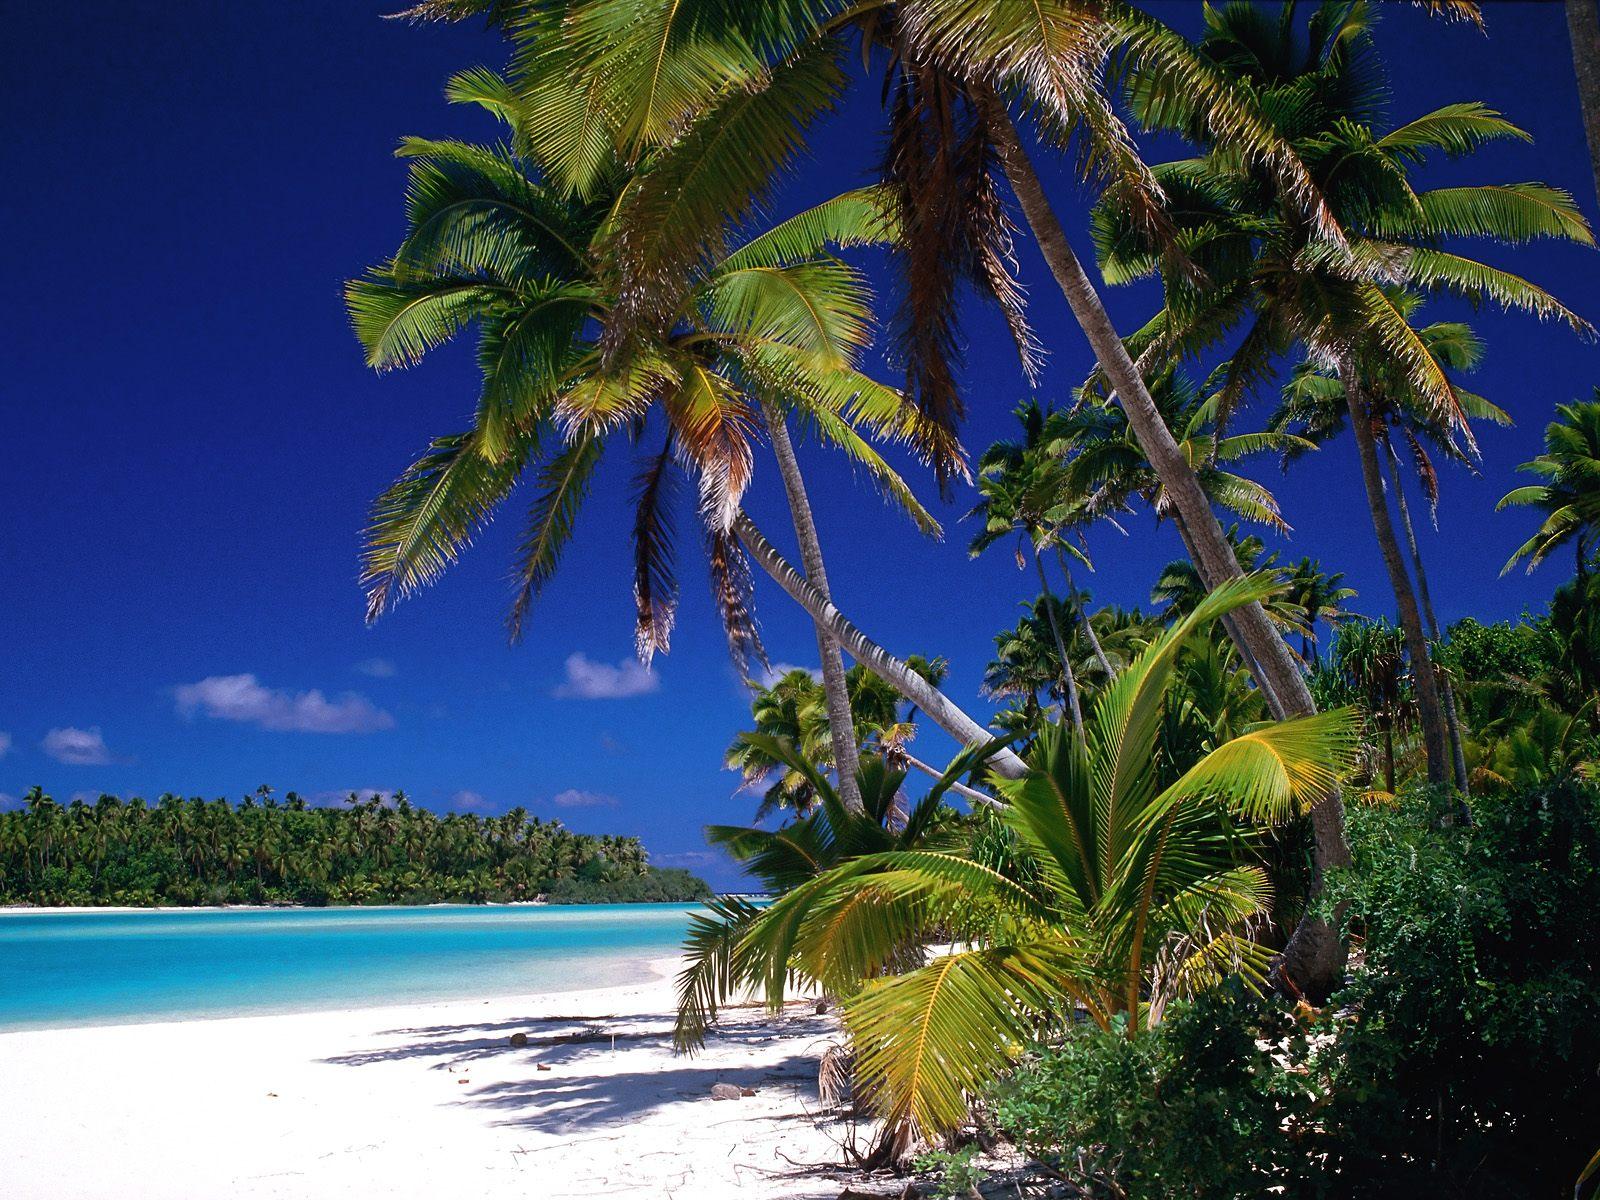 35 Desktop Backgrounds Beach Download Free Beautiful: Wallpapers Fair: Download Beaches & Islands Background